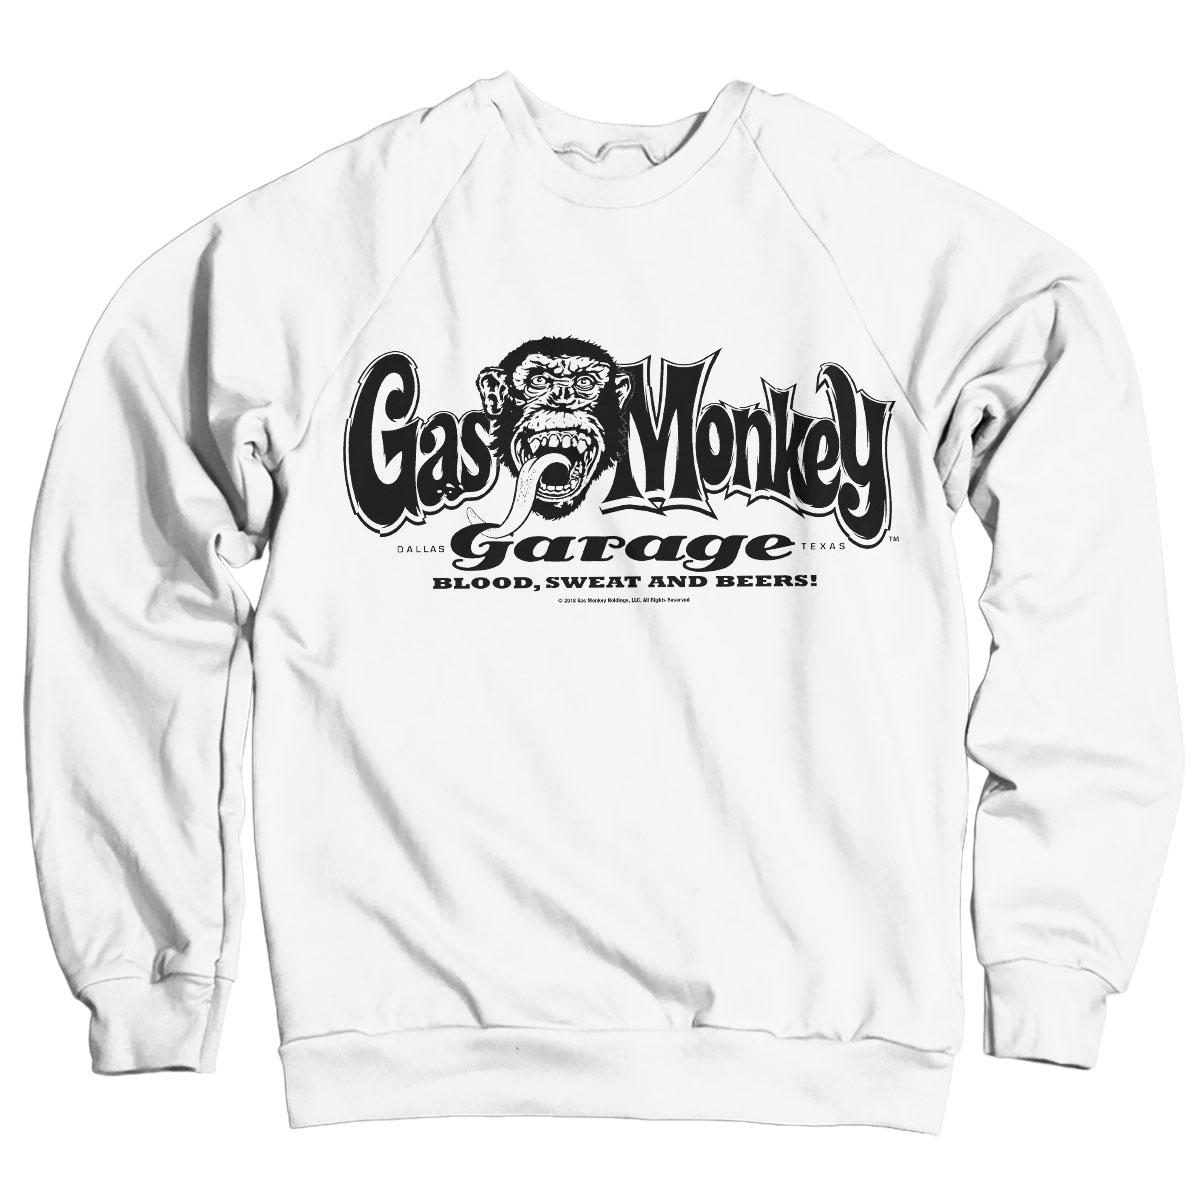 texas sweat à capuche s-xxl taille Licence officielle gas monkey garage dallas